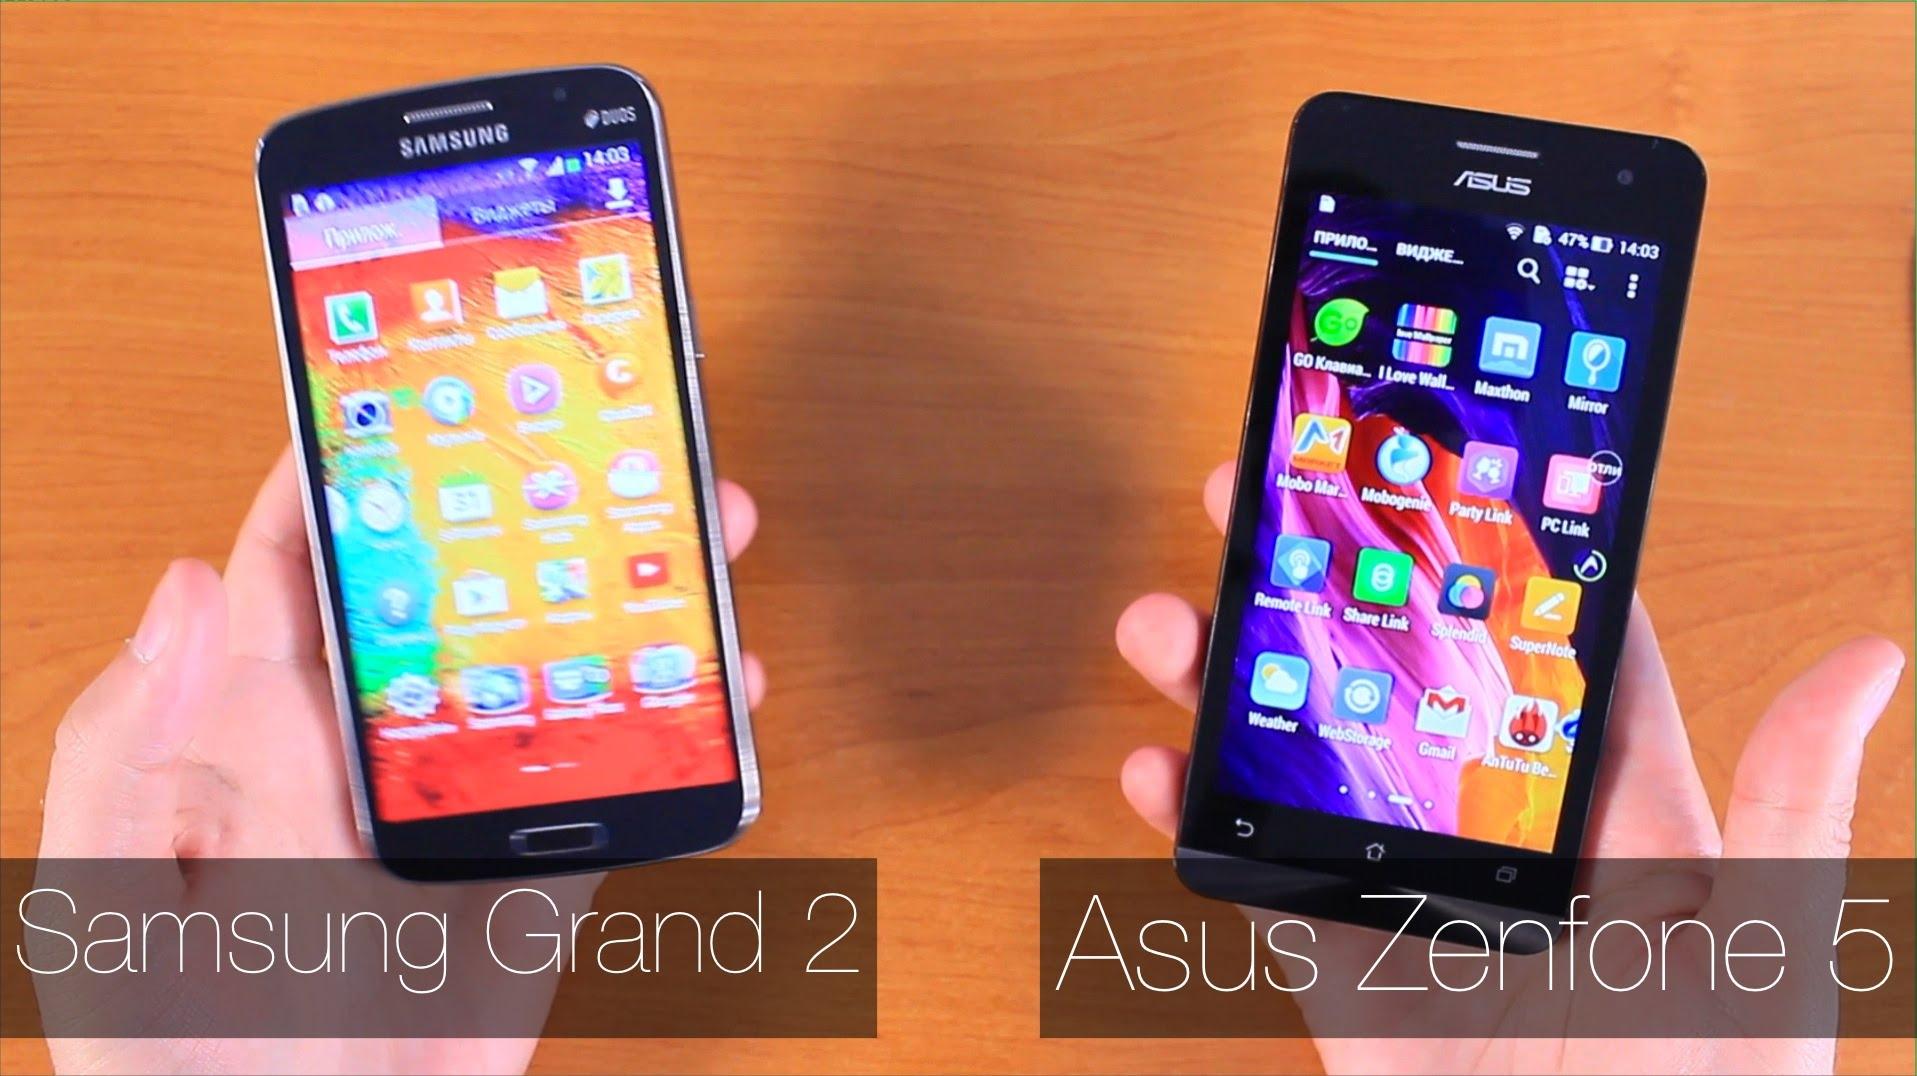 Samsung-Galaxy-Grand-2-vs-Asus-ZenFone-5